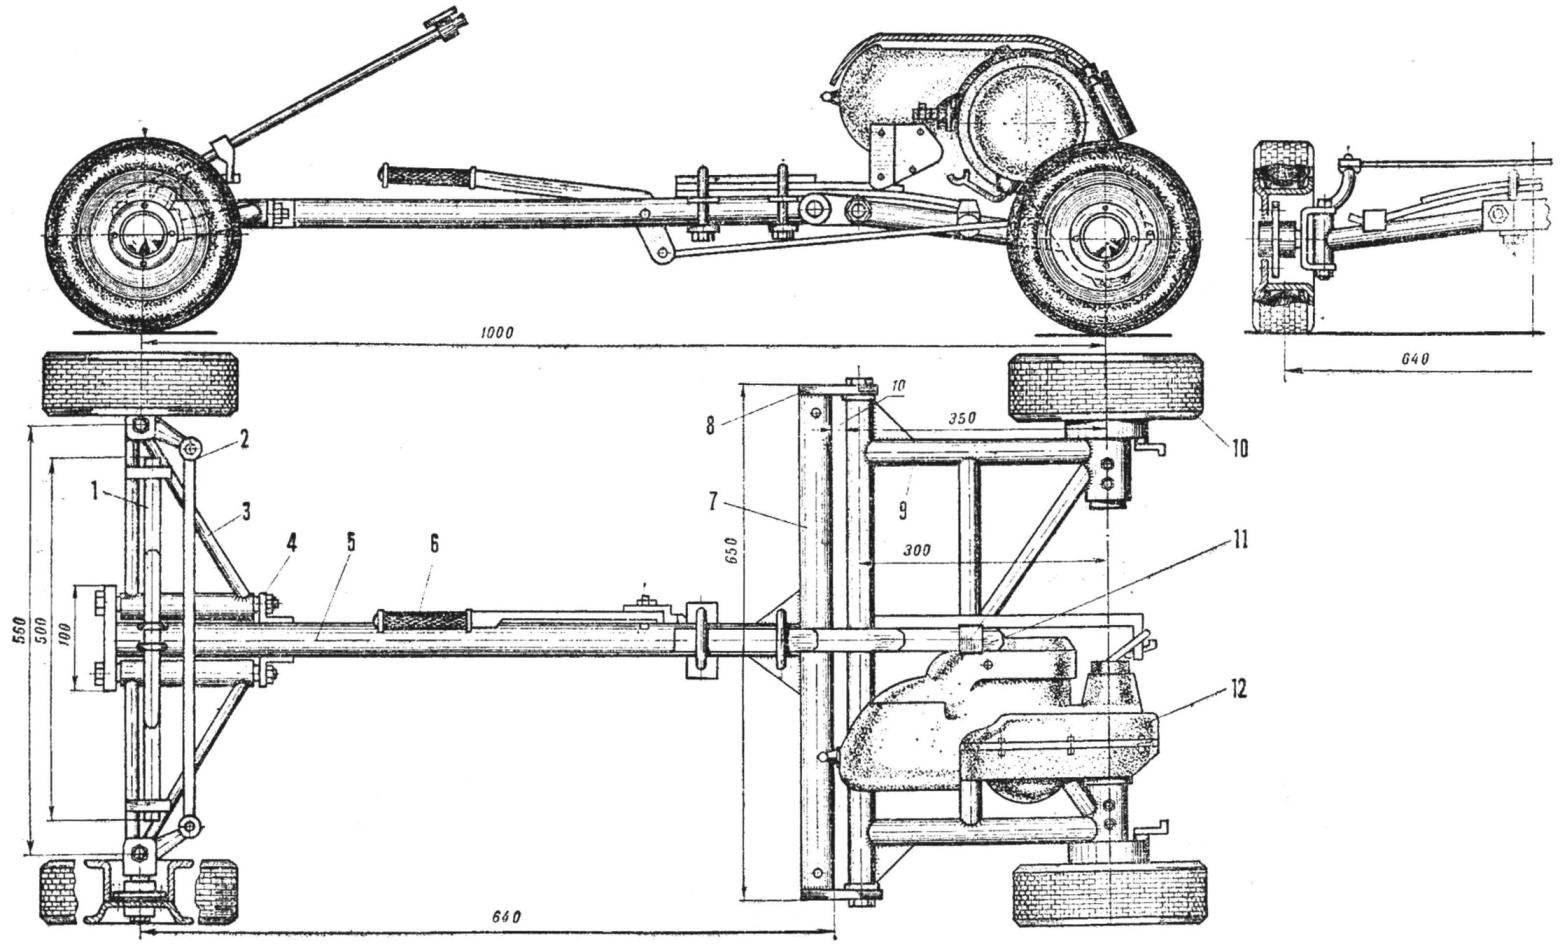 Рис. 2. Шасси микроавтомобиля